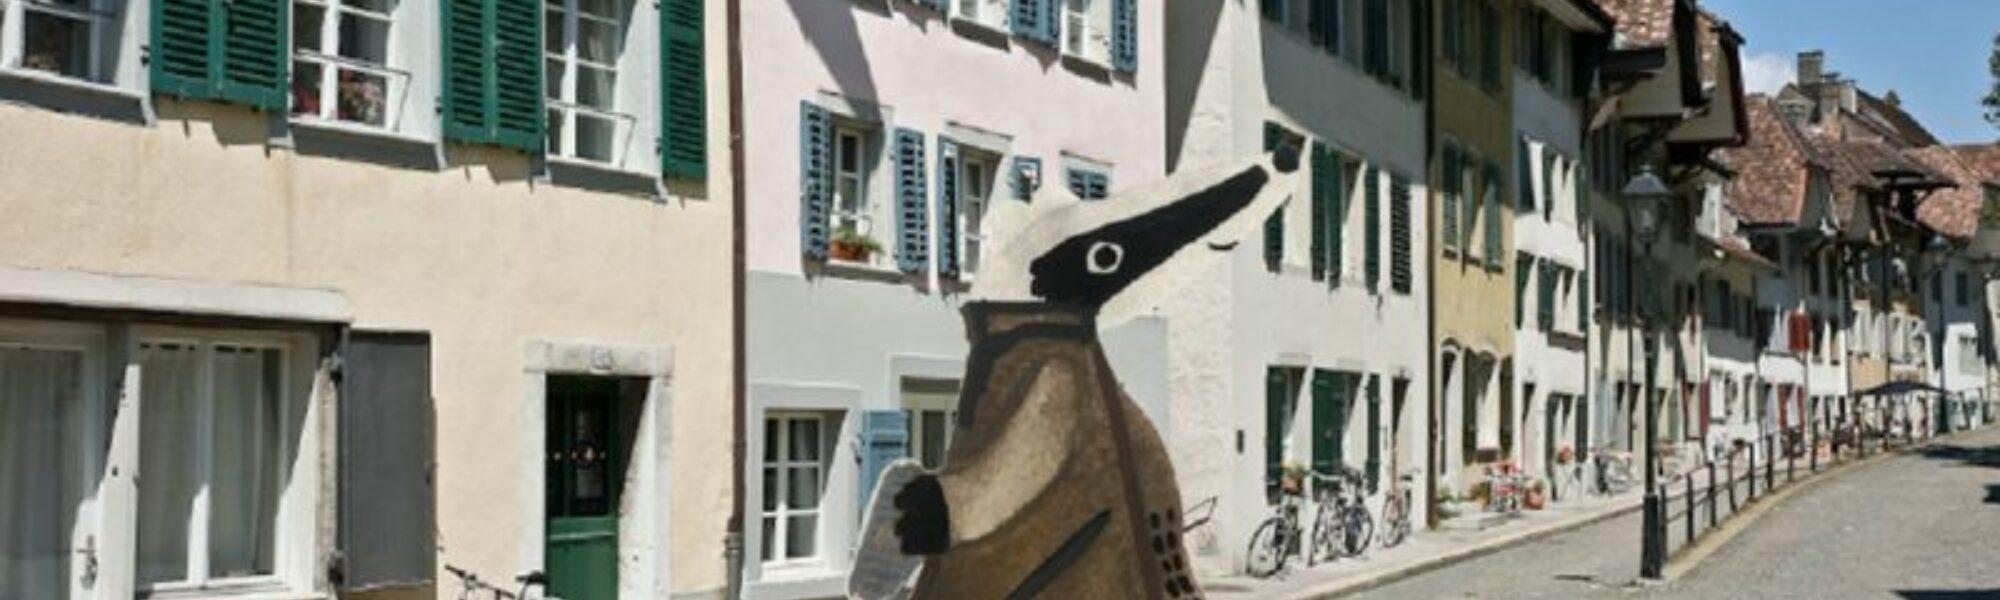 Detektiv-Trail Aarau